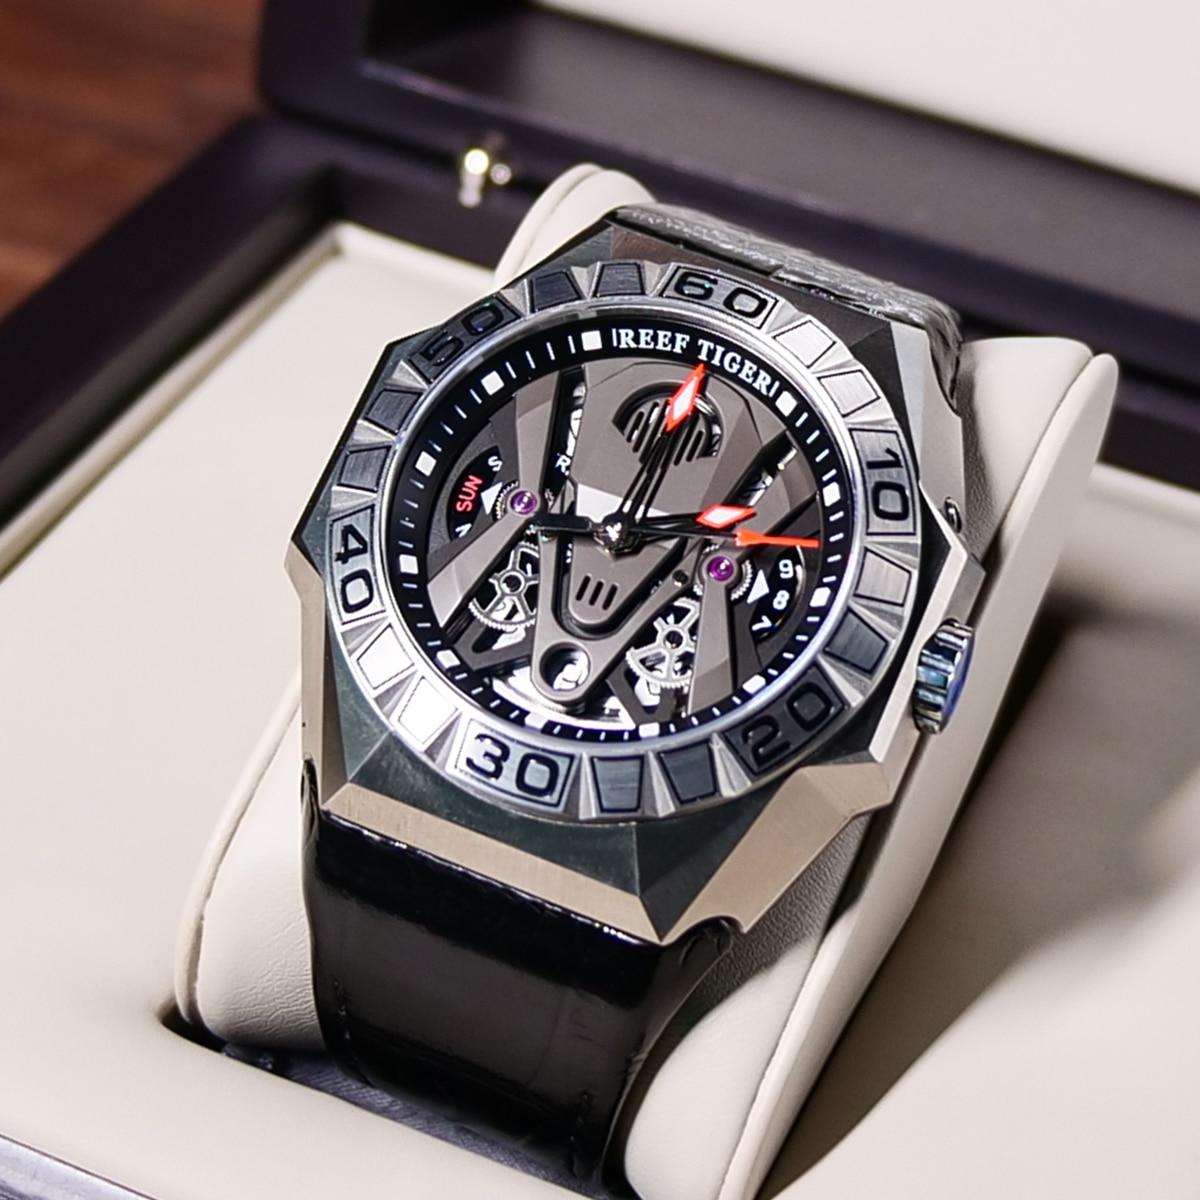 Reef Tiger/RT Top Brand Men Sport Watches Automatic Skeleton Watch Steel Waterproof Leather Strap Relogio Masculino RGA6912 3